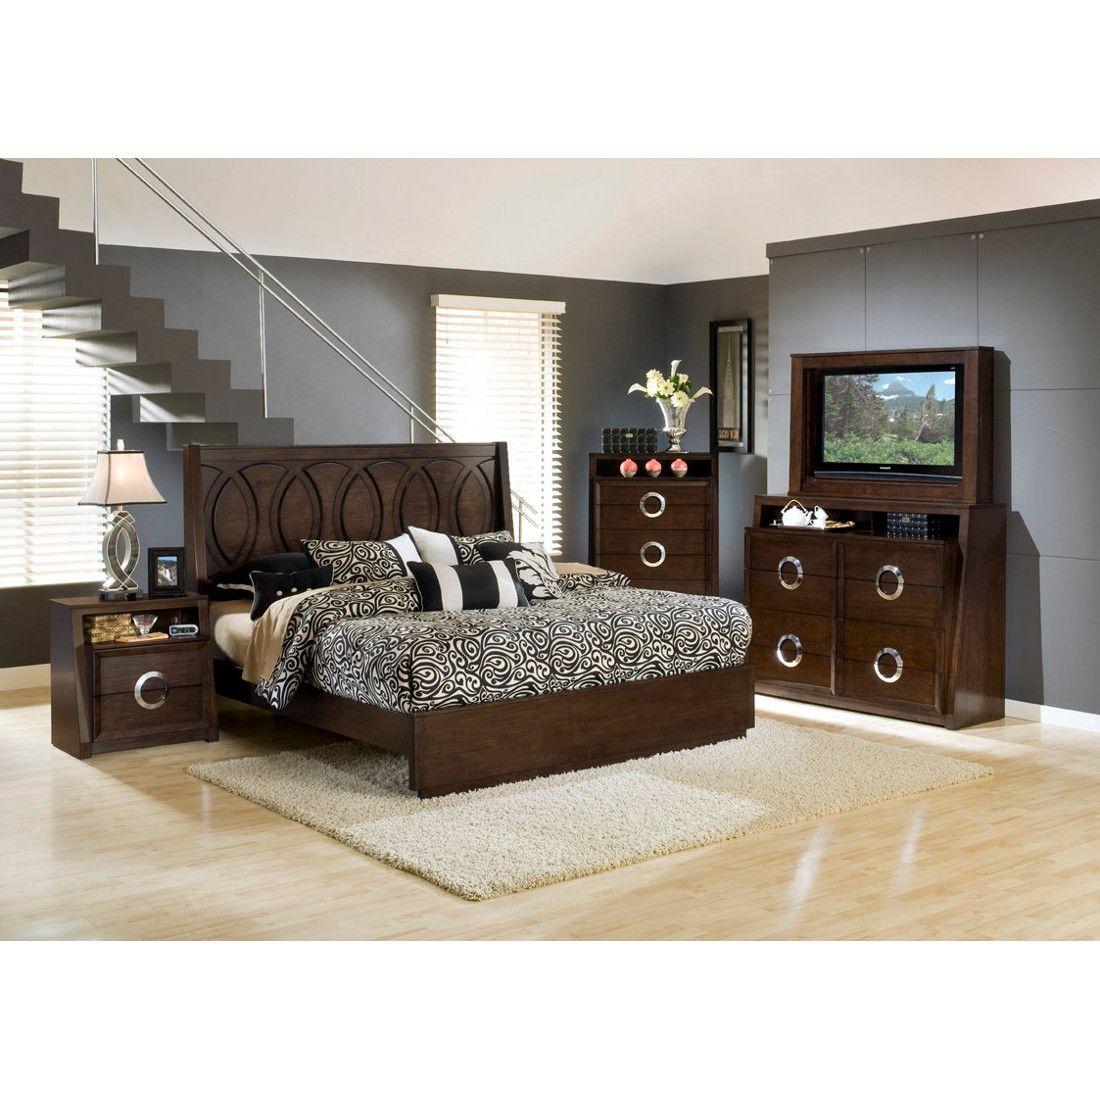 Bed, TV Dresser & TV Mirror